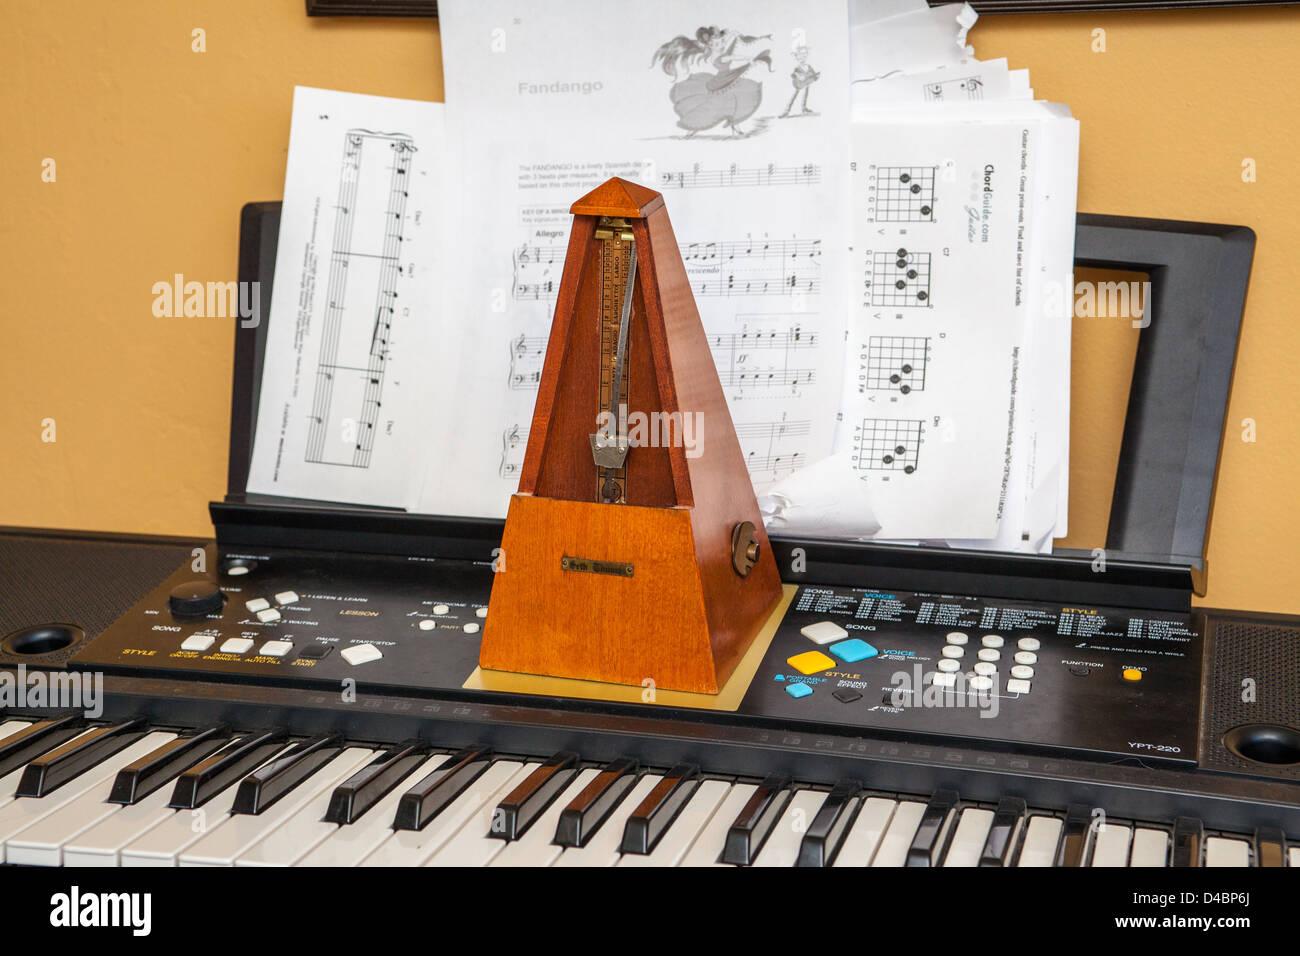 A metronome sheet music and electronic keyboard - Stock Image